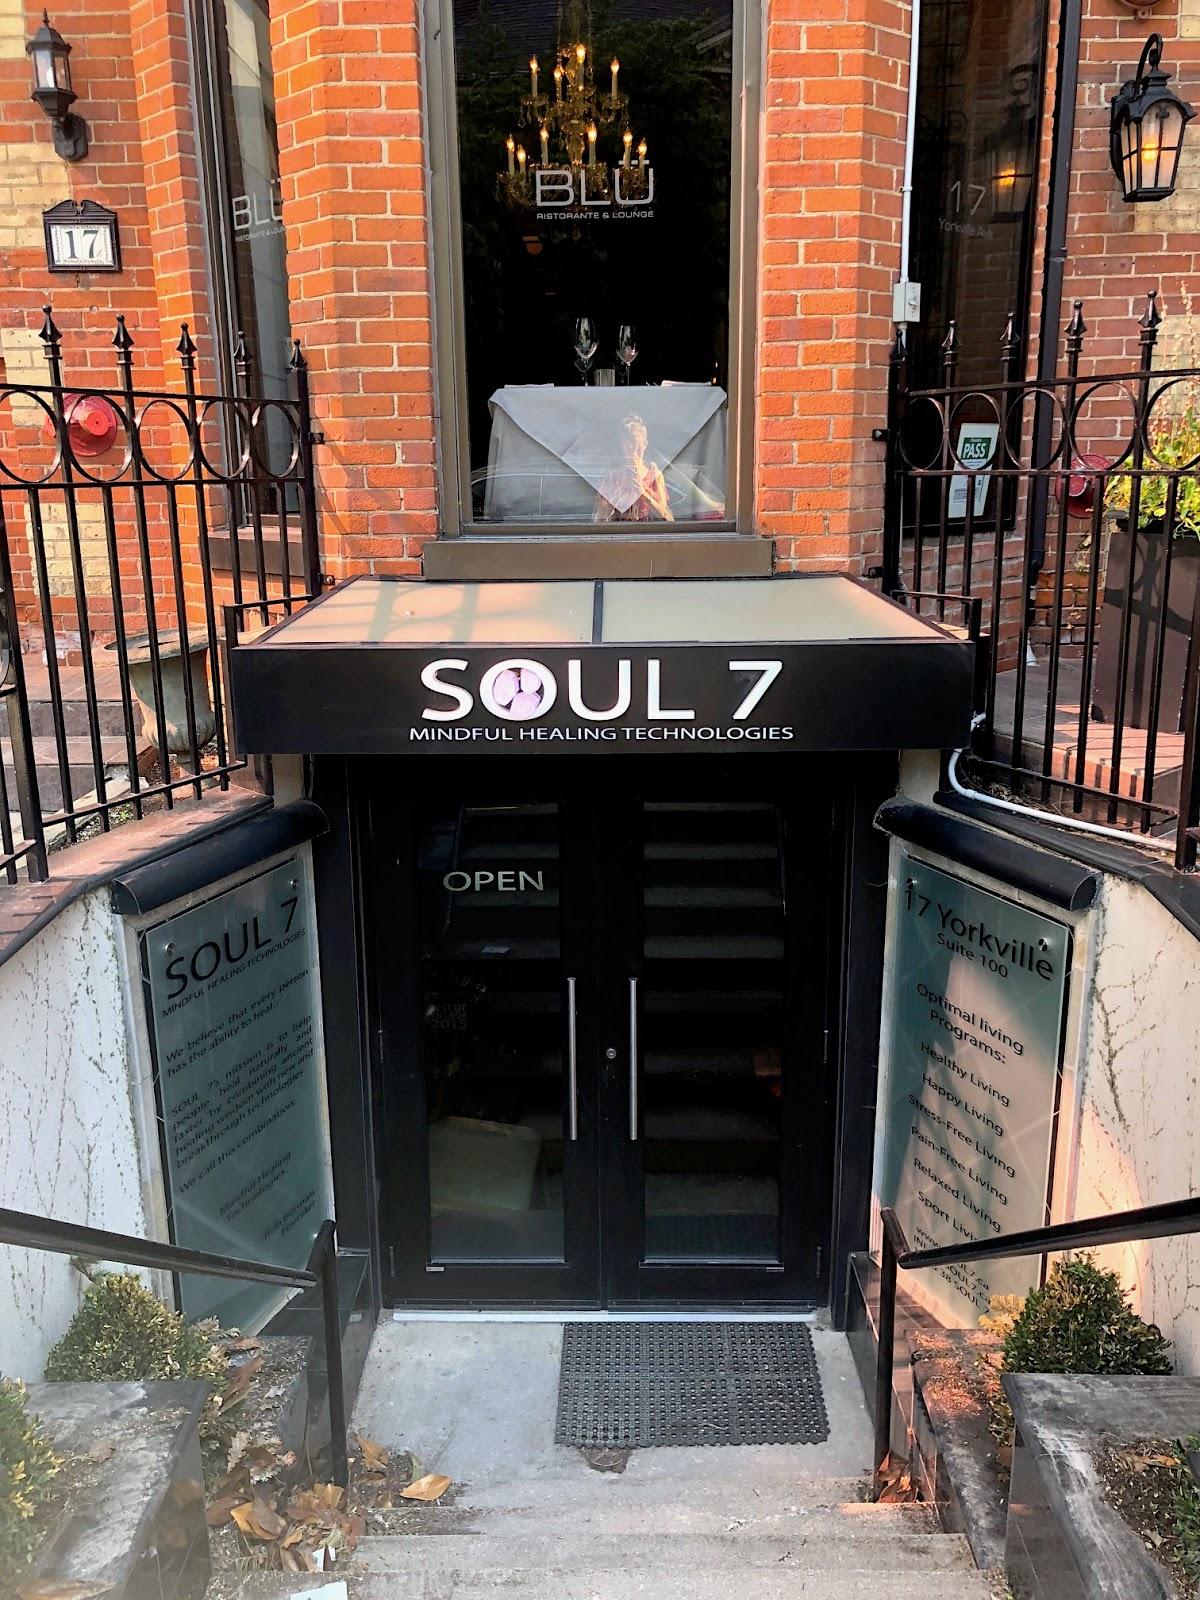 Soul 7 Review